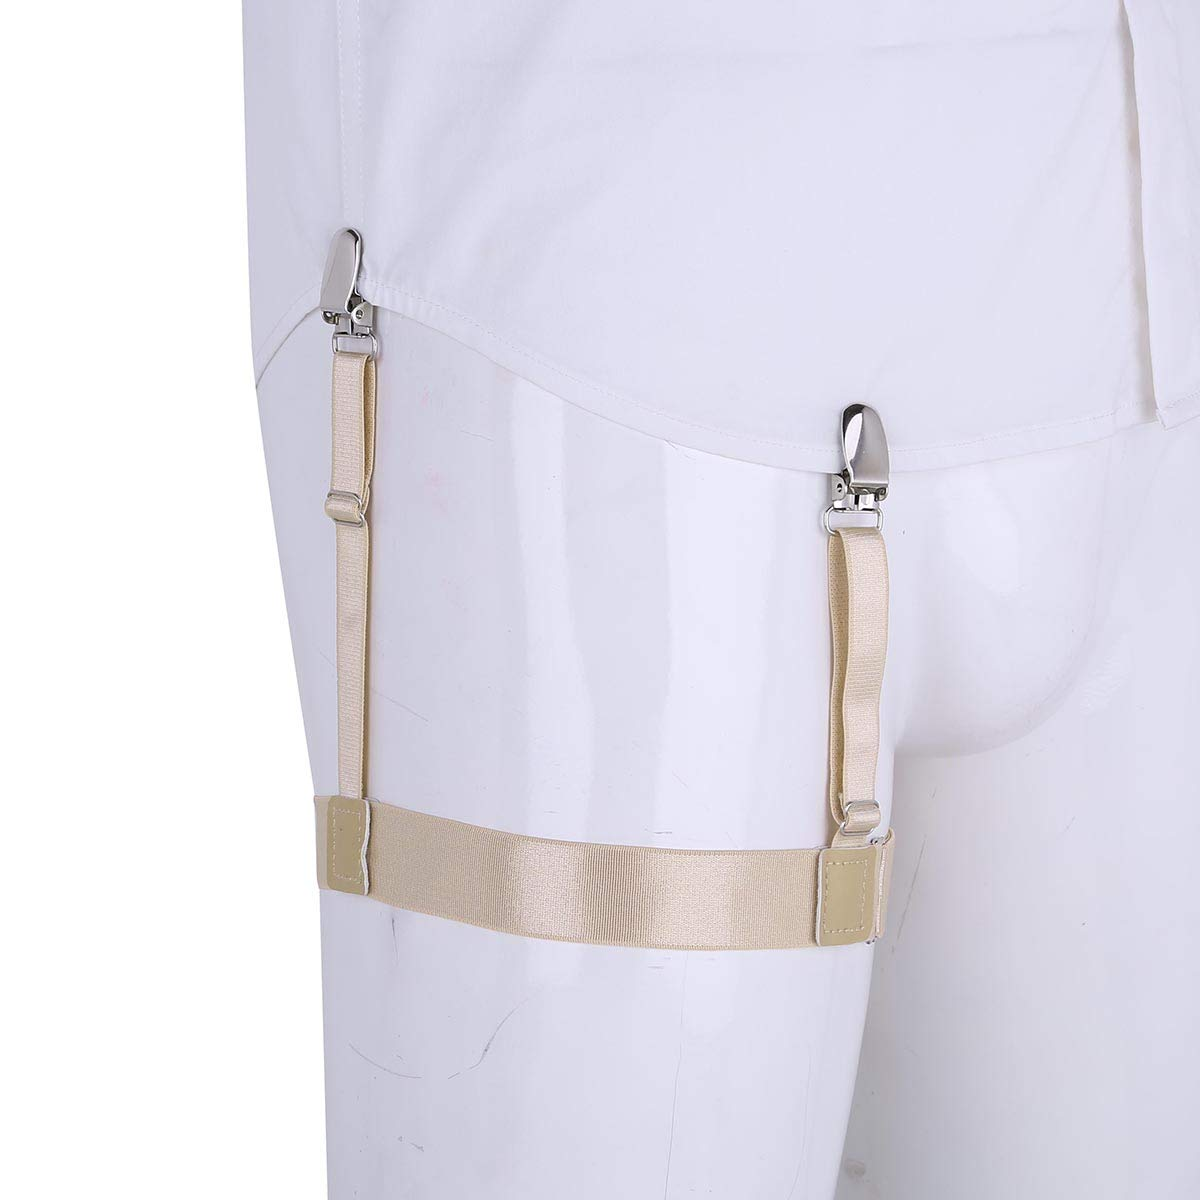 Freebily Mens Dress Shirt Stays Adjustable Garter Belts Non-slip Clamps